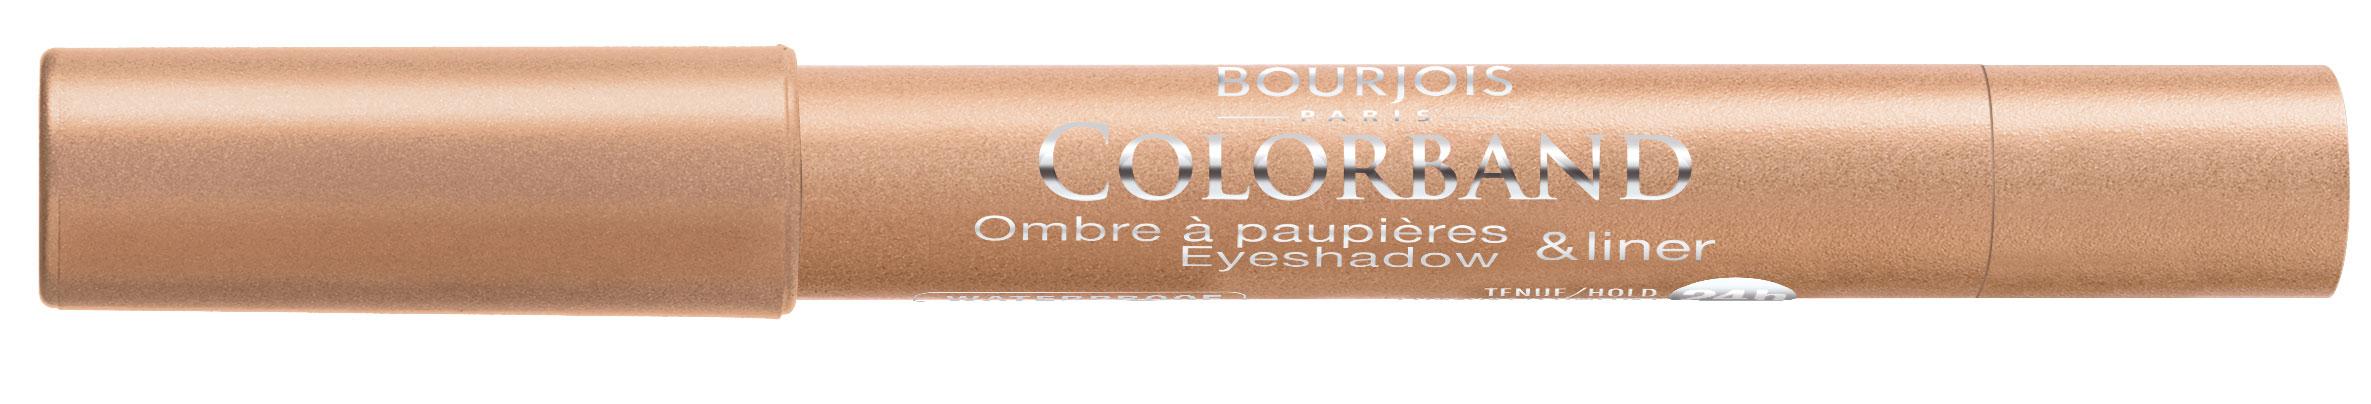 Colorband, tono 03 Beige Minimaliste.